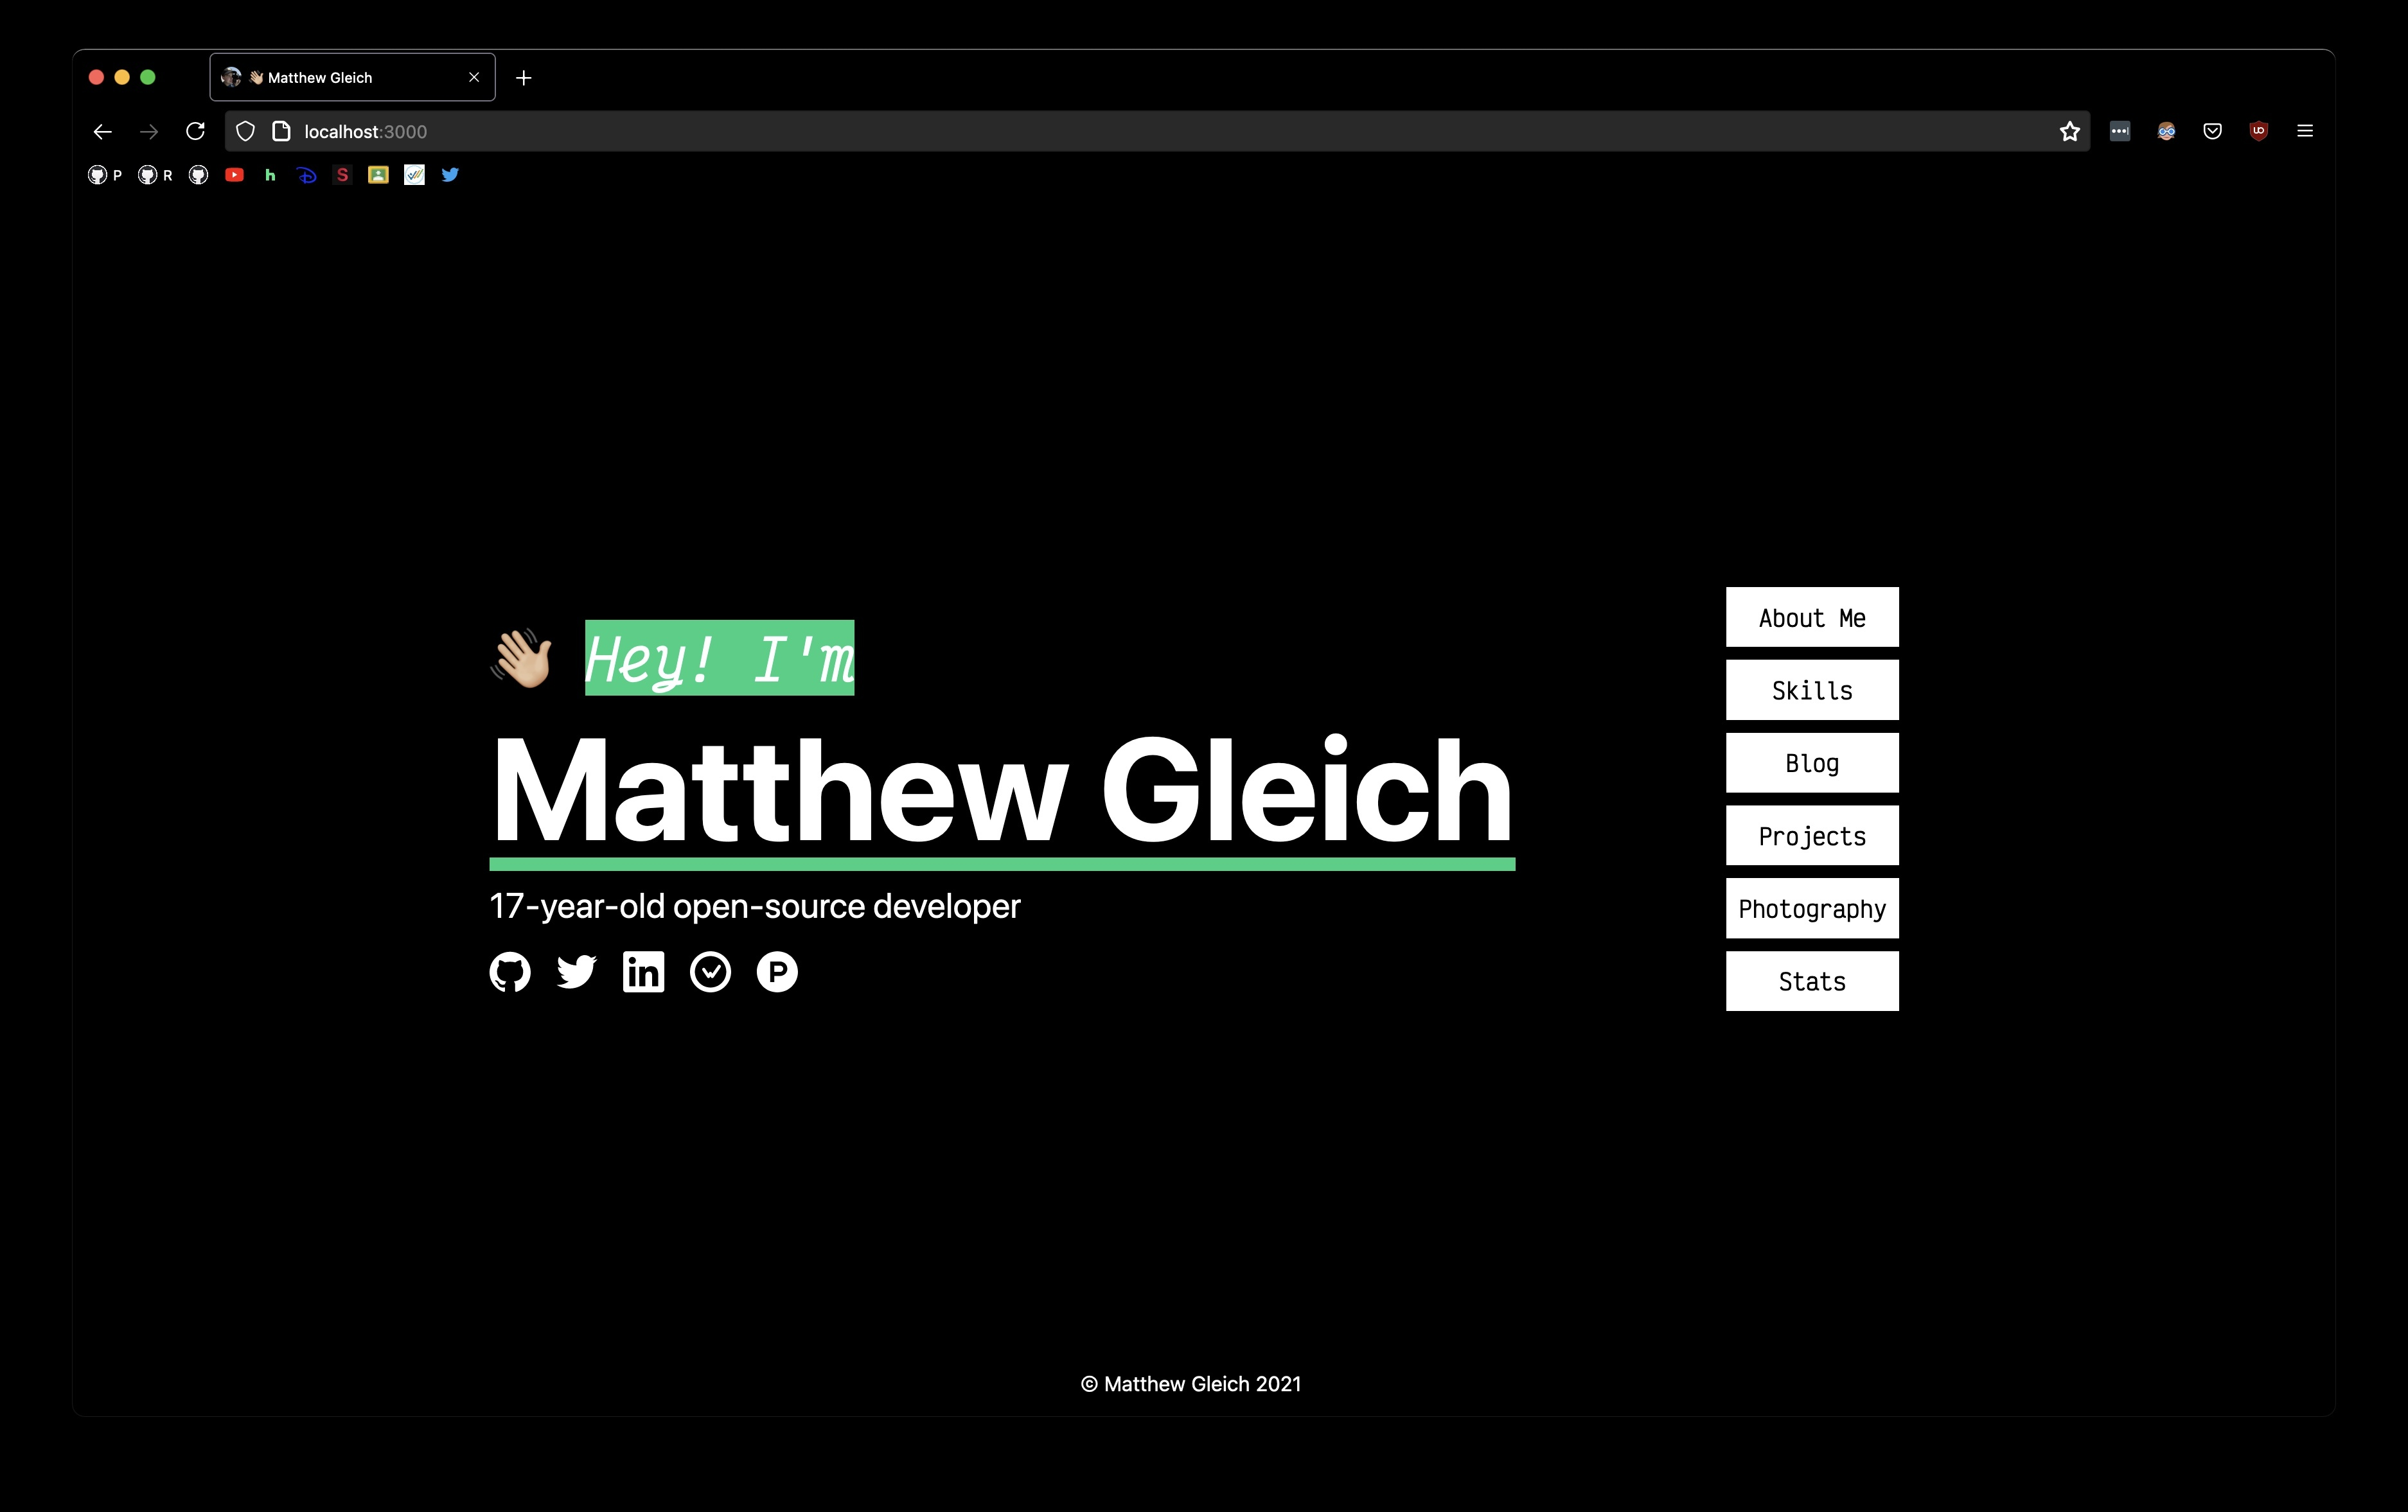 https://cloud-hneiq808d-hack-club-bot.vercel.app/0screen_shot_2021-04-25_at_1.31.07_pm.jpg